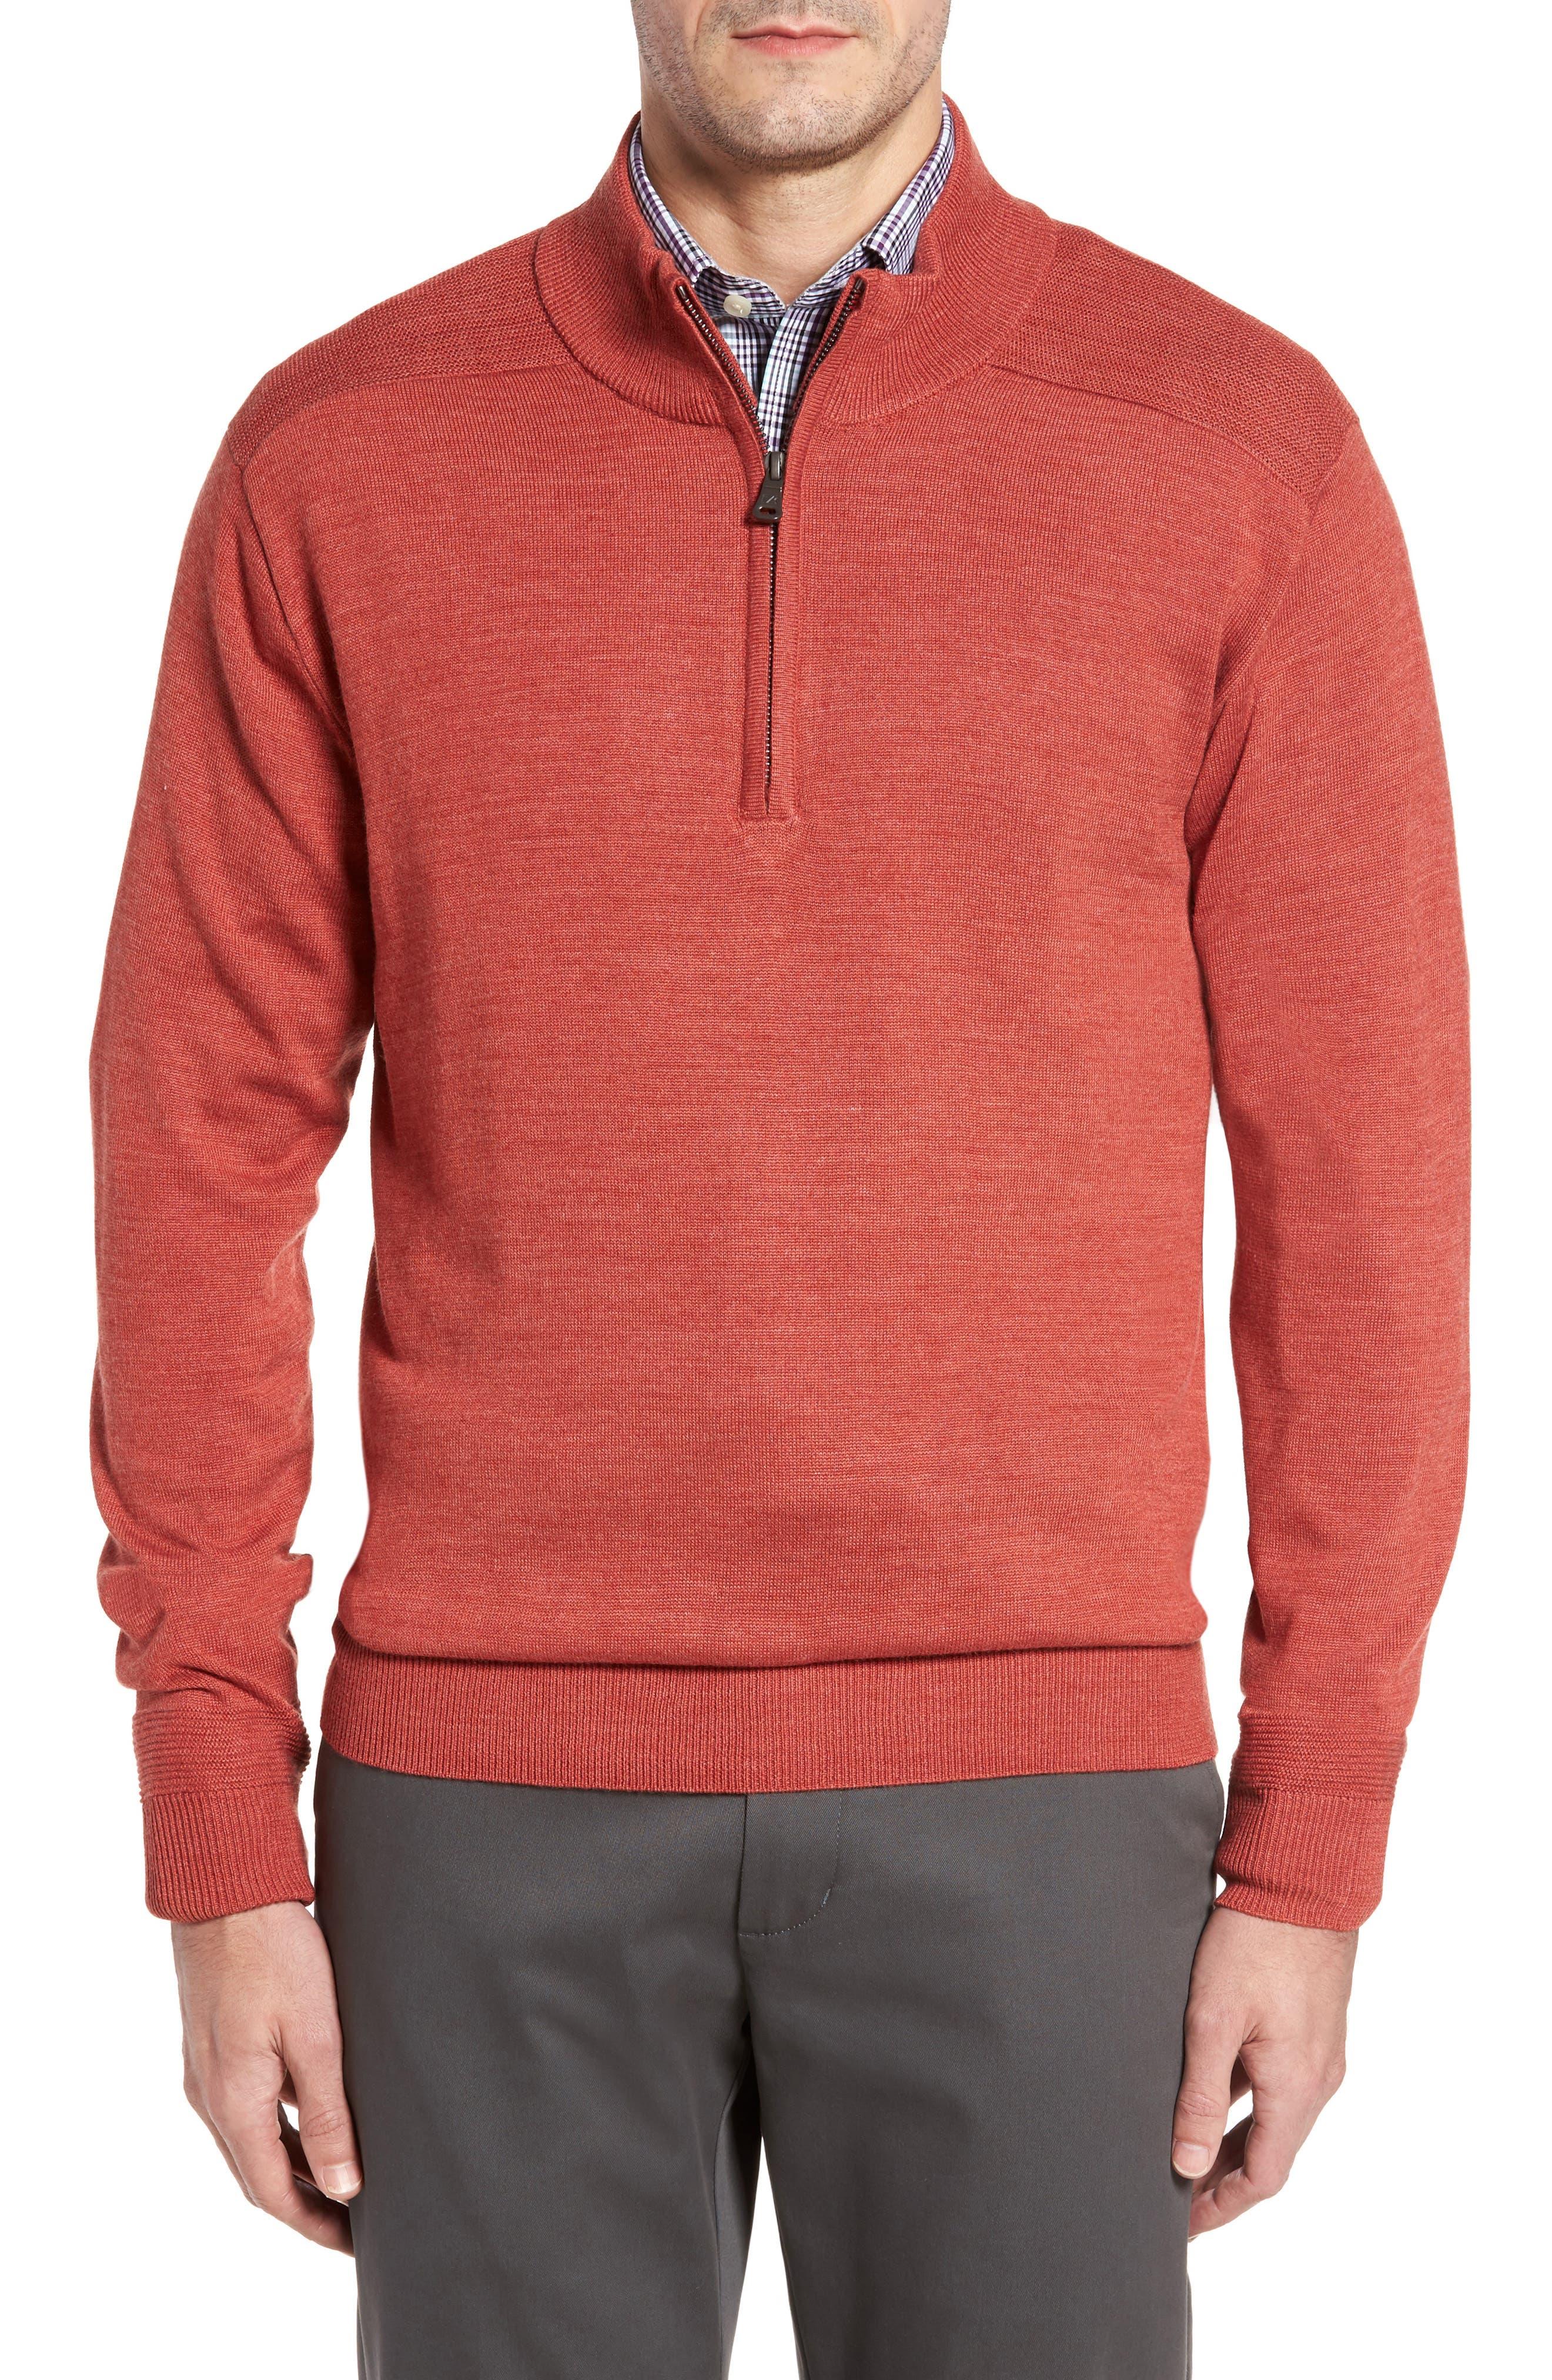 Douglas Quarter Zip Wool Blend Sweater,                         Main,                         color, 600